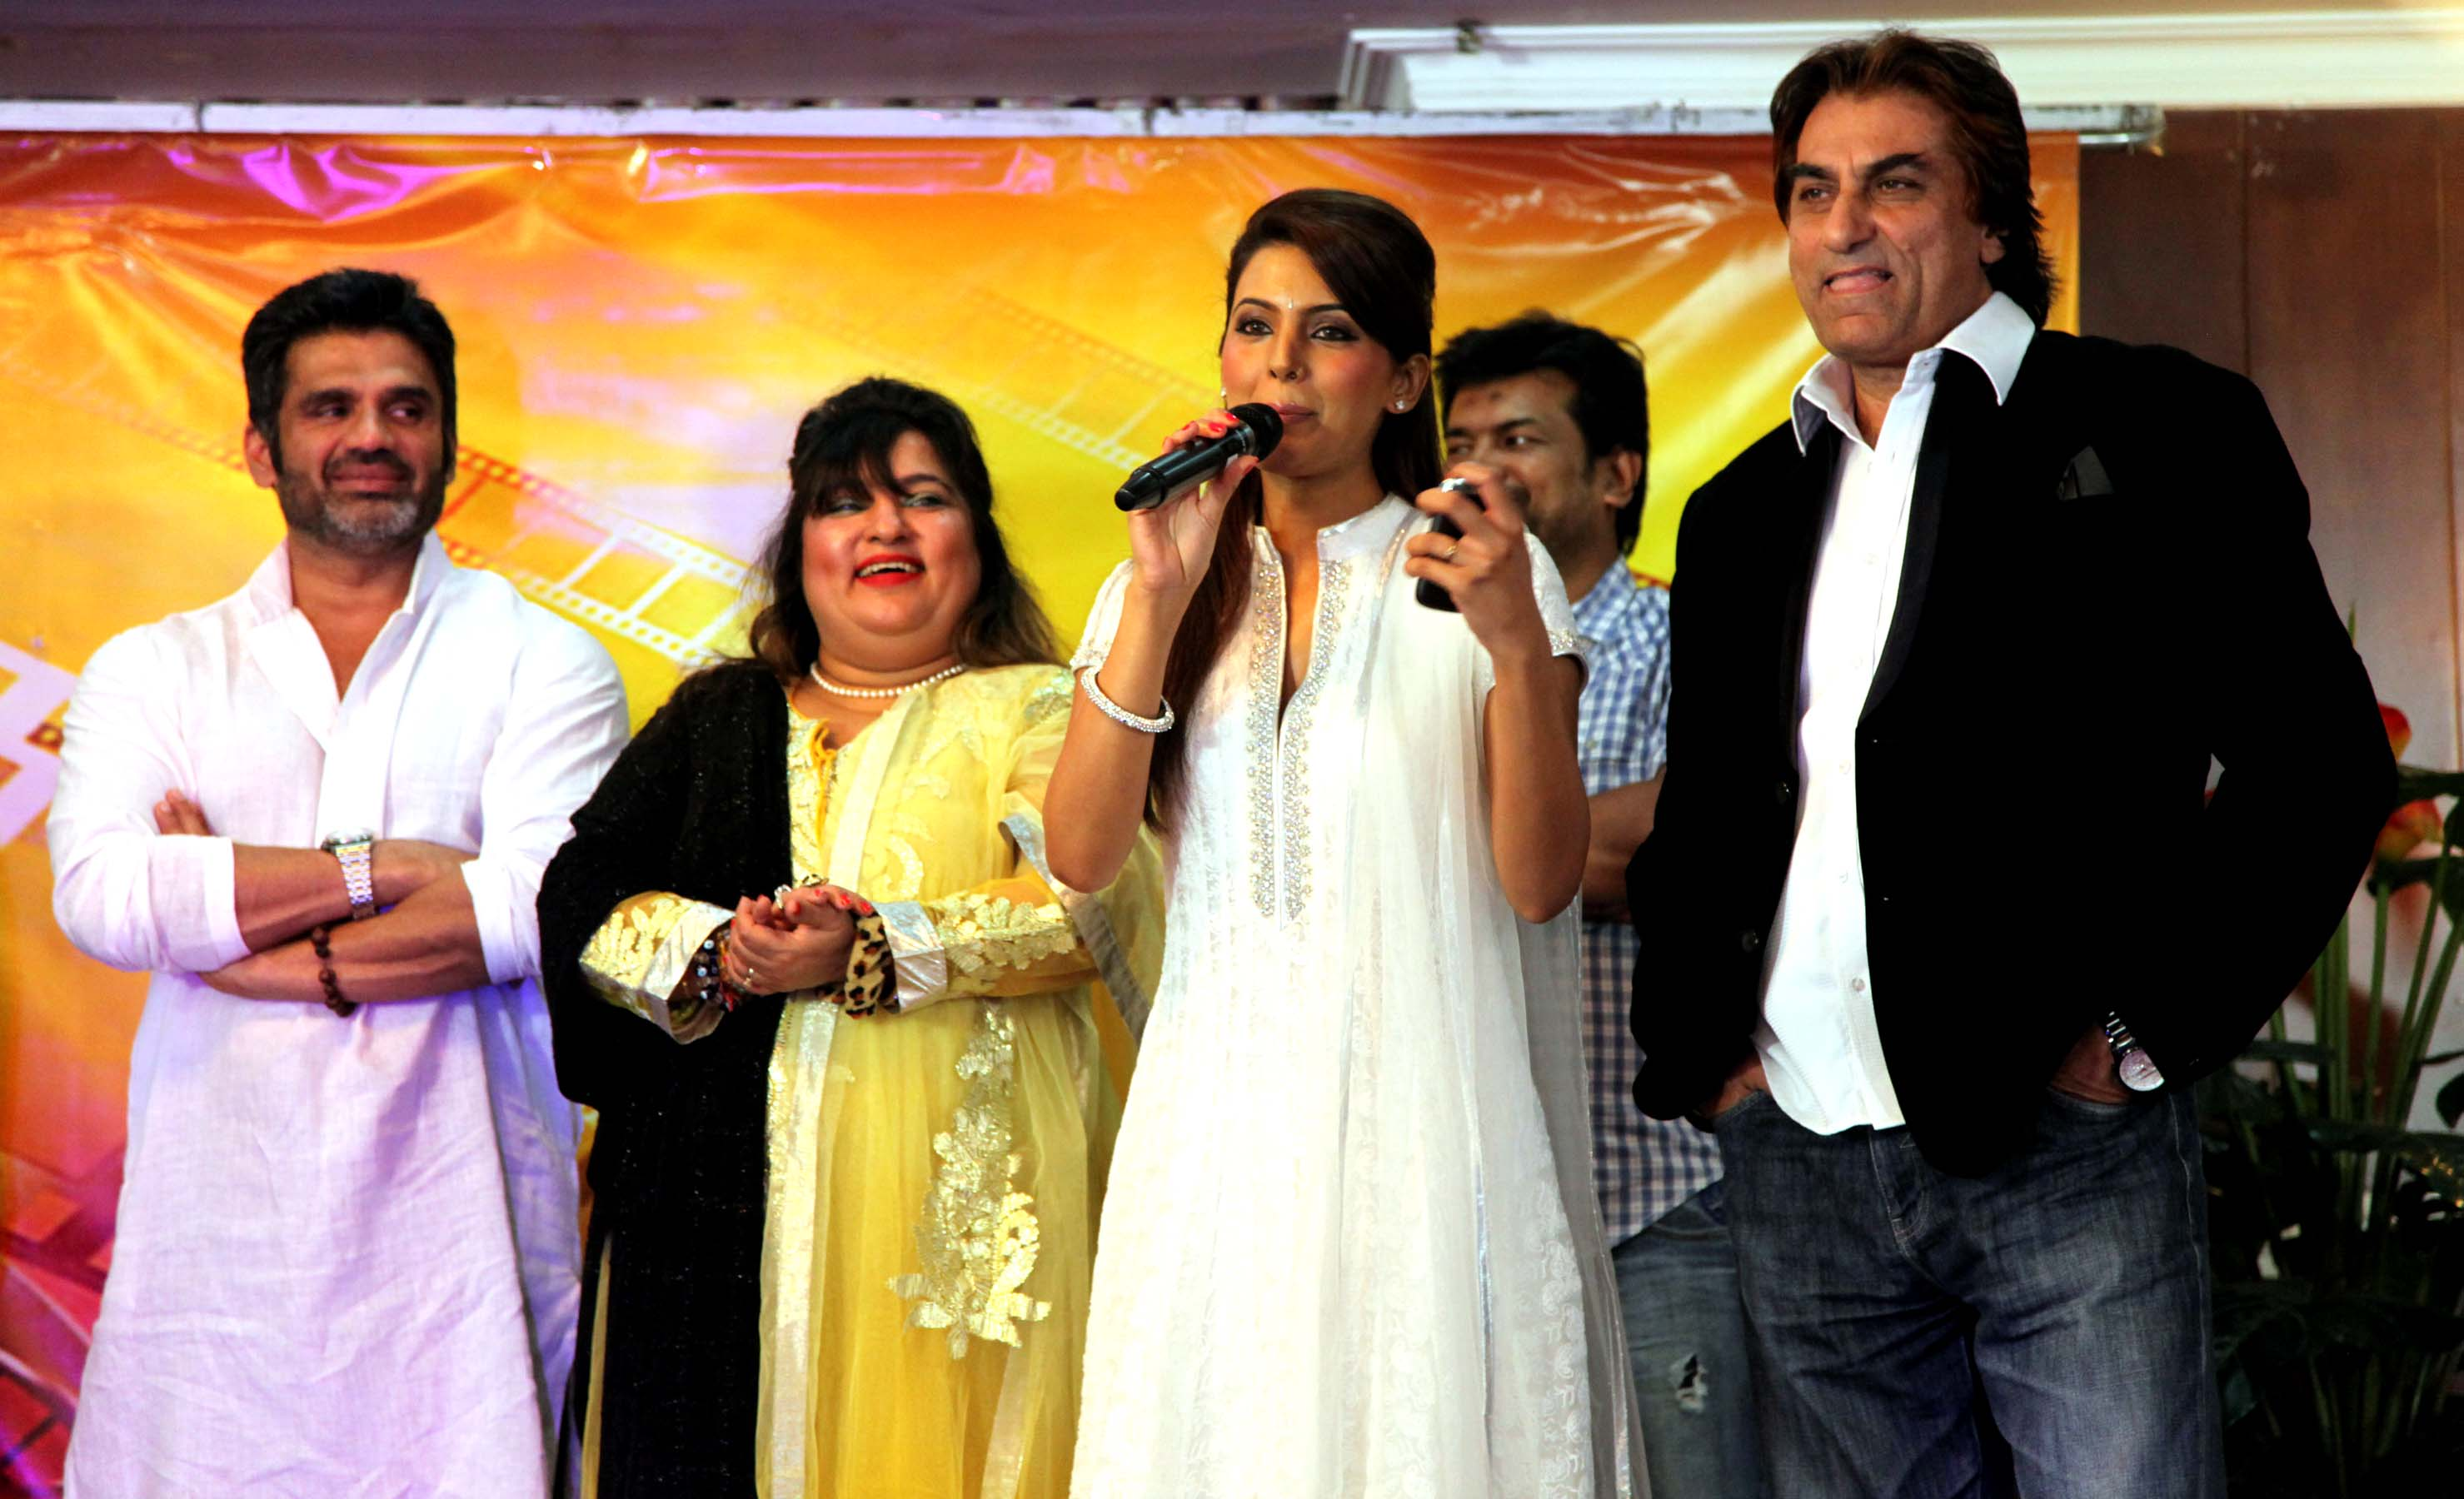 sunil shetty,dolly bindra,geeta basra & ali khan